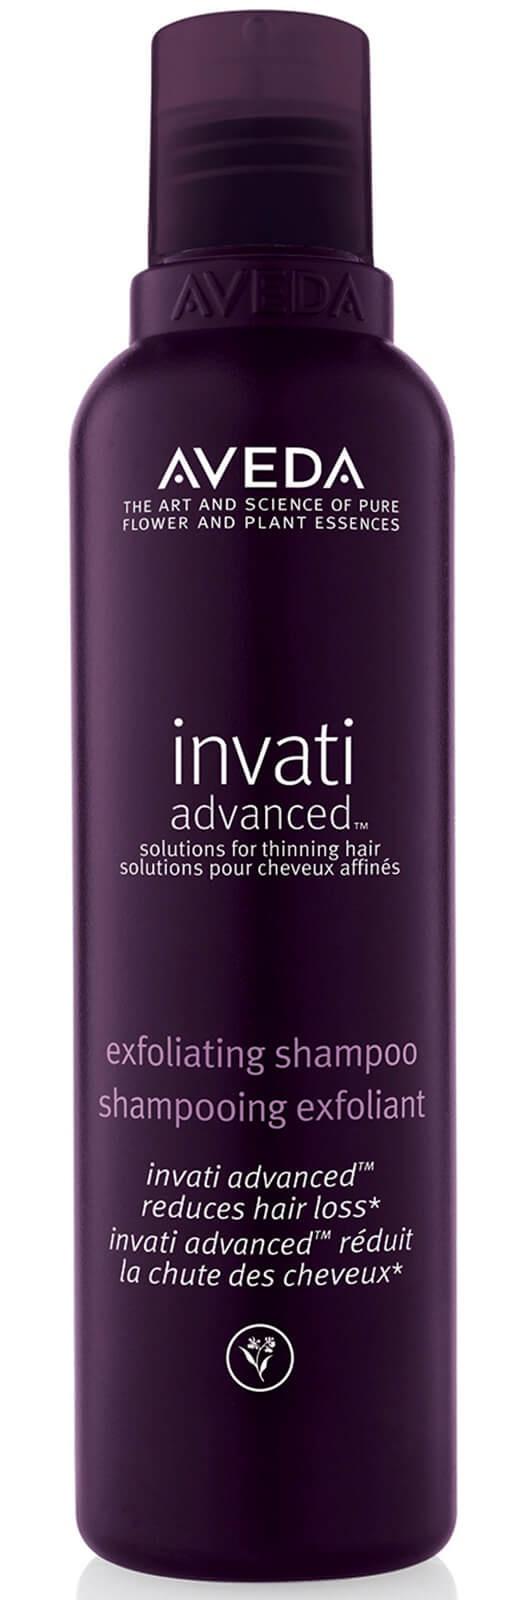 Aveda Invati Advanced ™ Exfoliating Shampoo